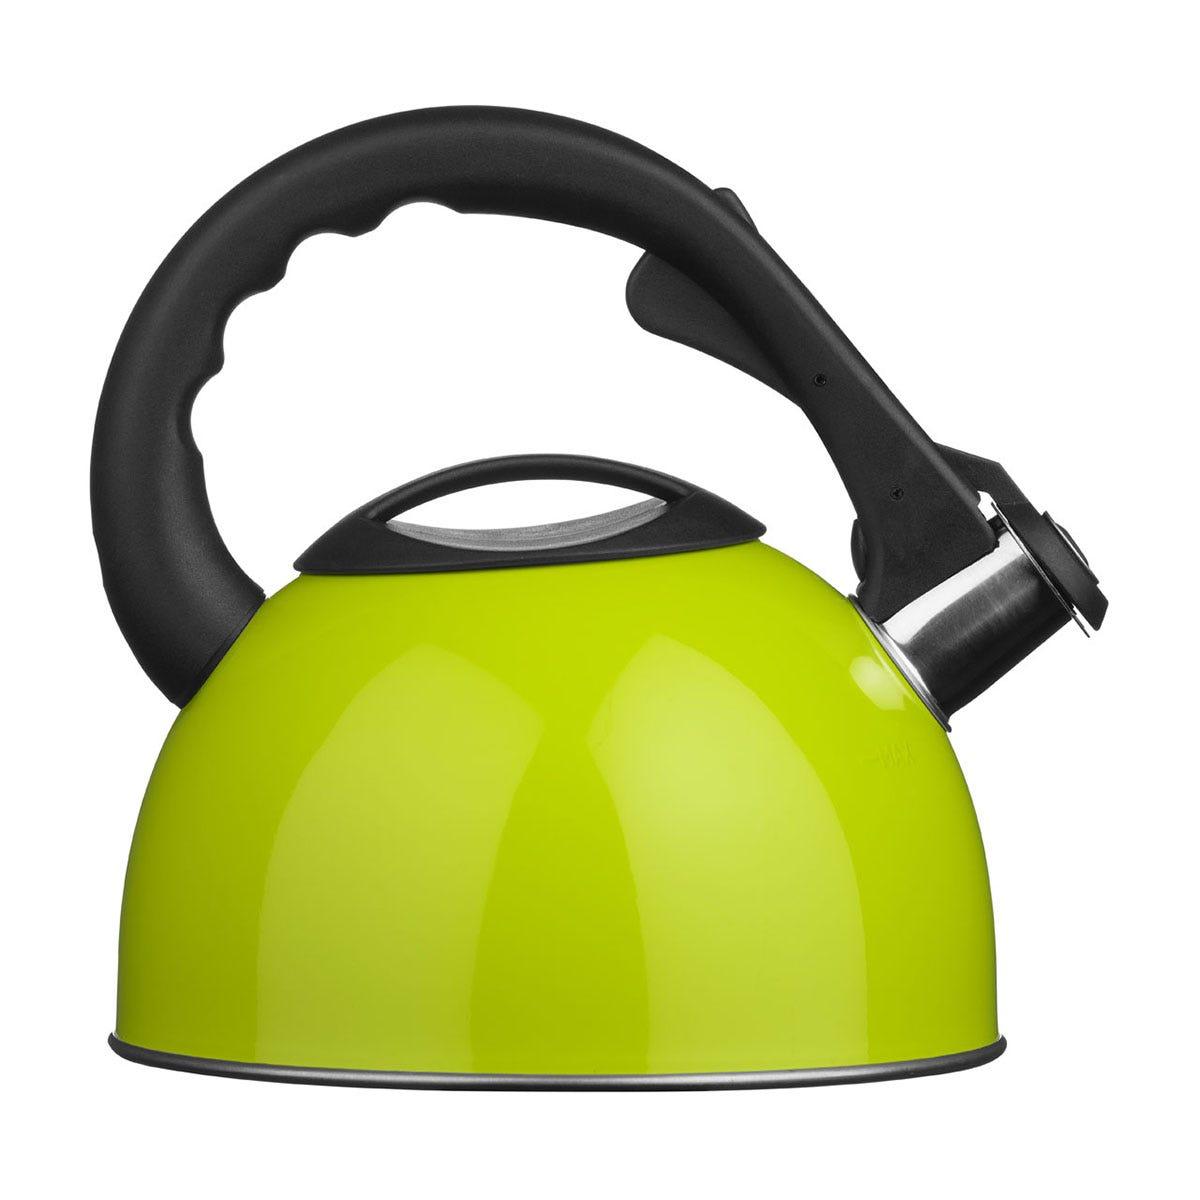 Premier Housewares 2.5L Stainless Steel Whistling Kettle - Lime Green